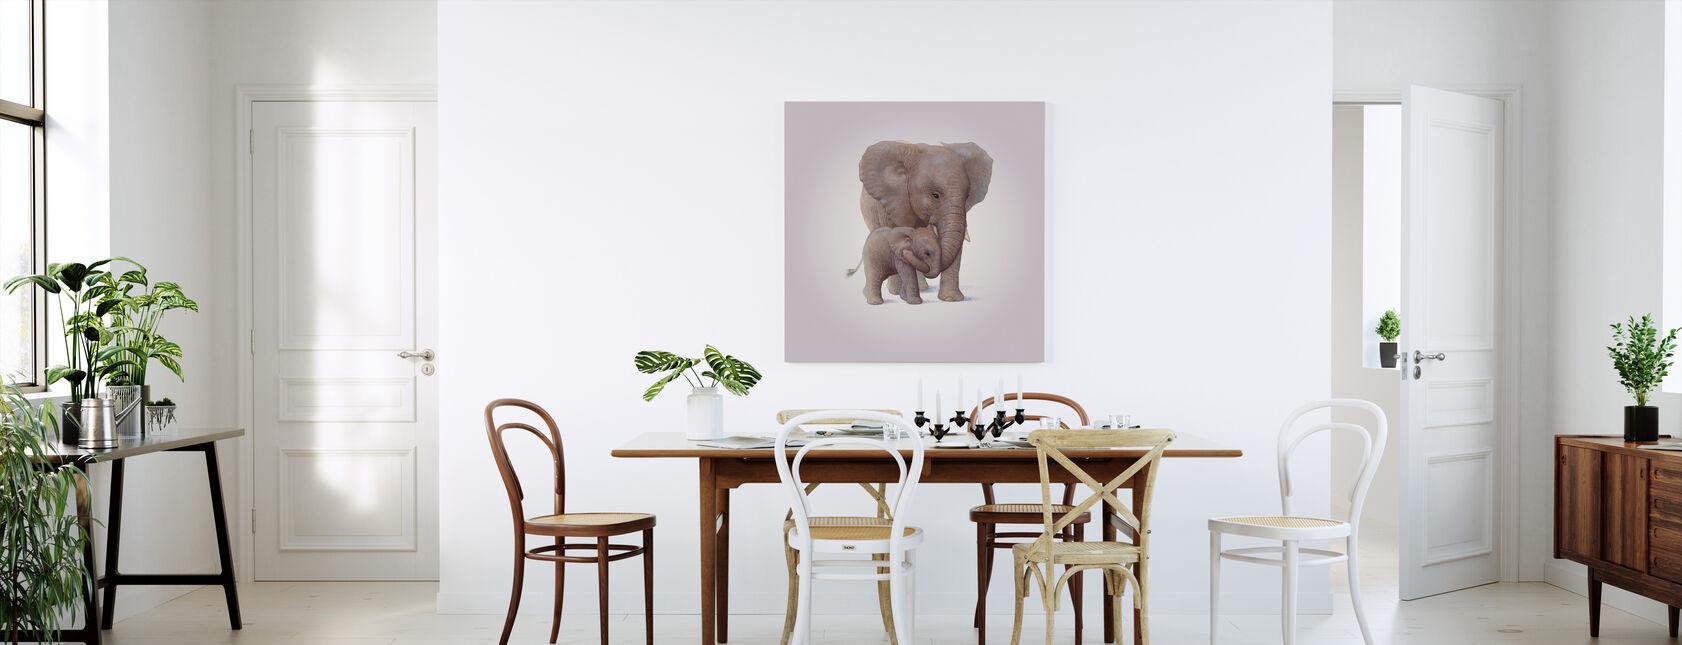 Olifant Kalf - Canvas print - Keuken